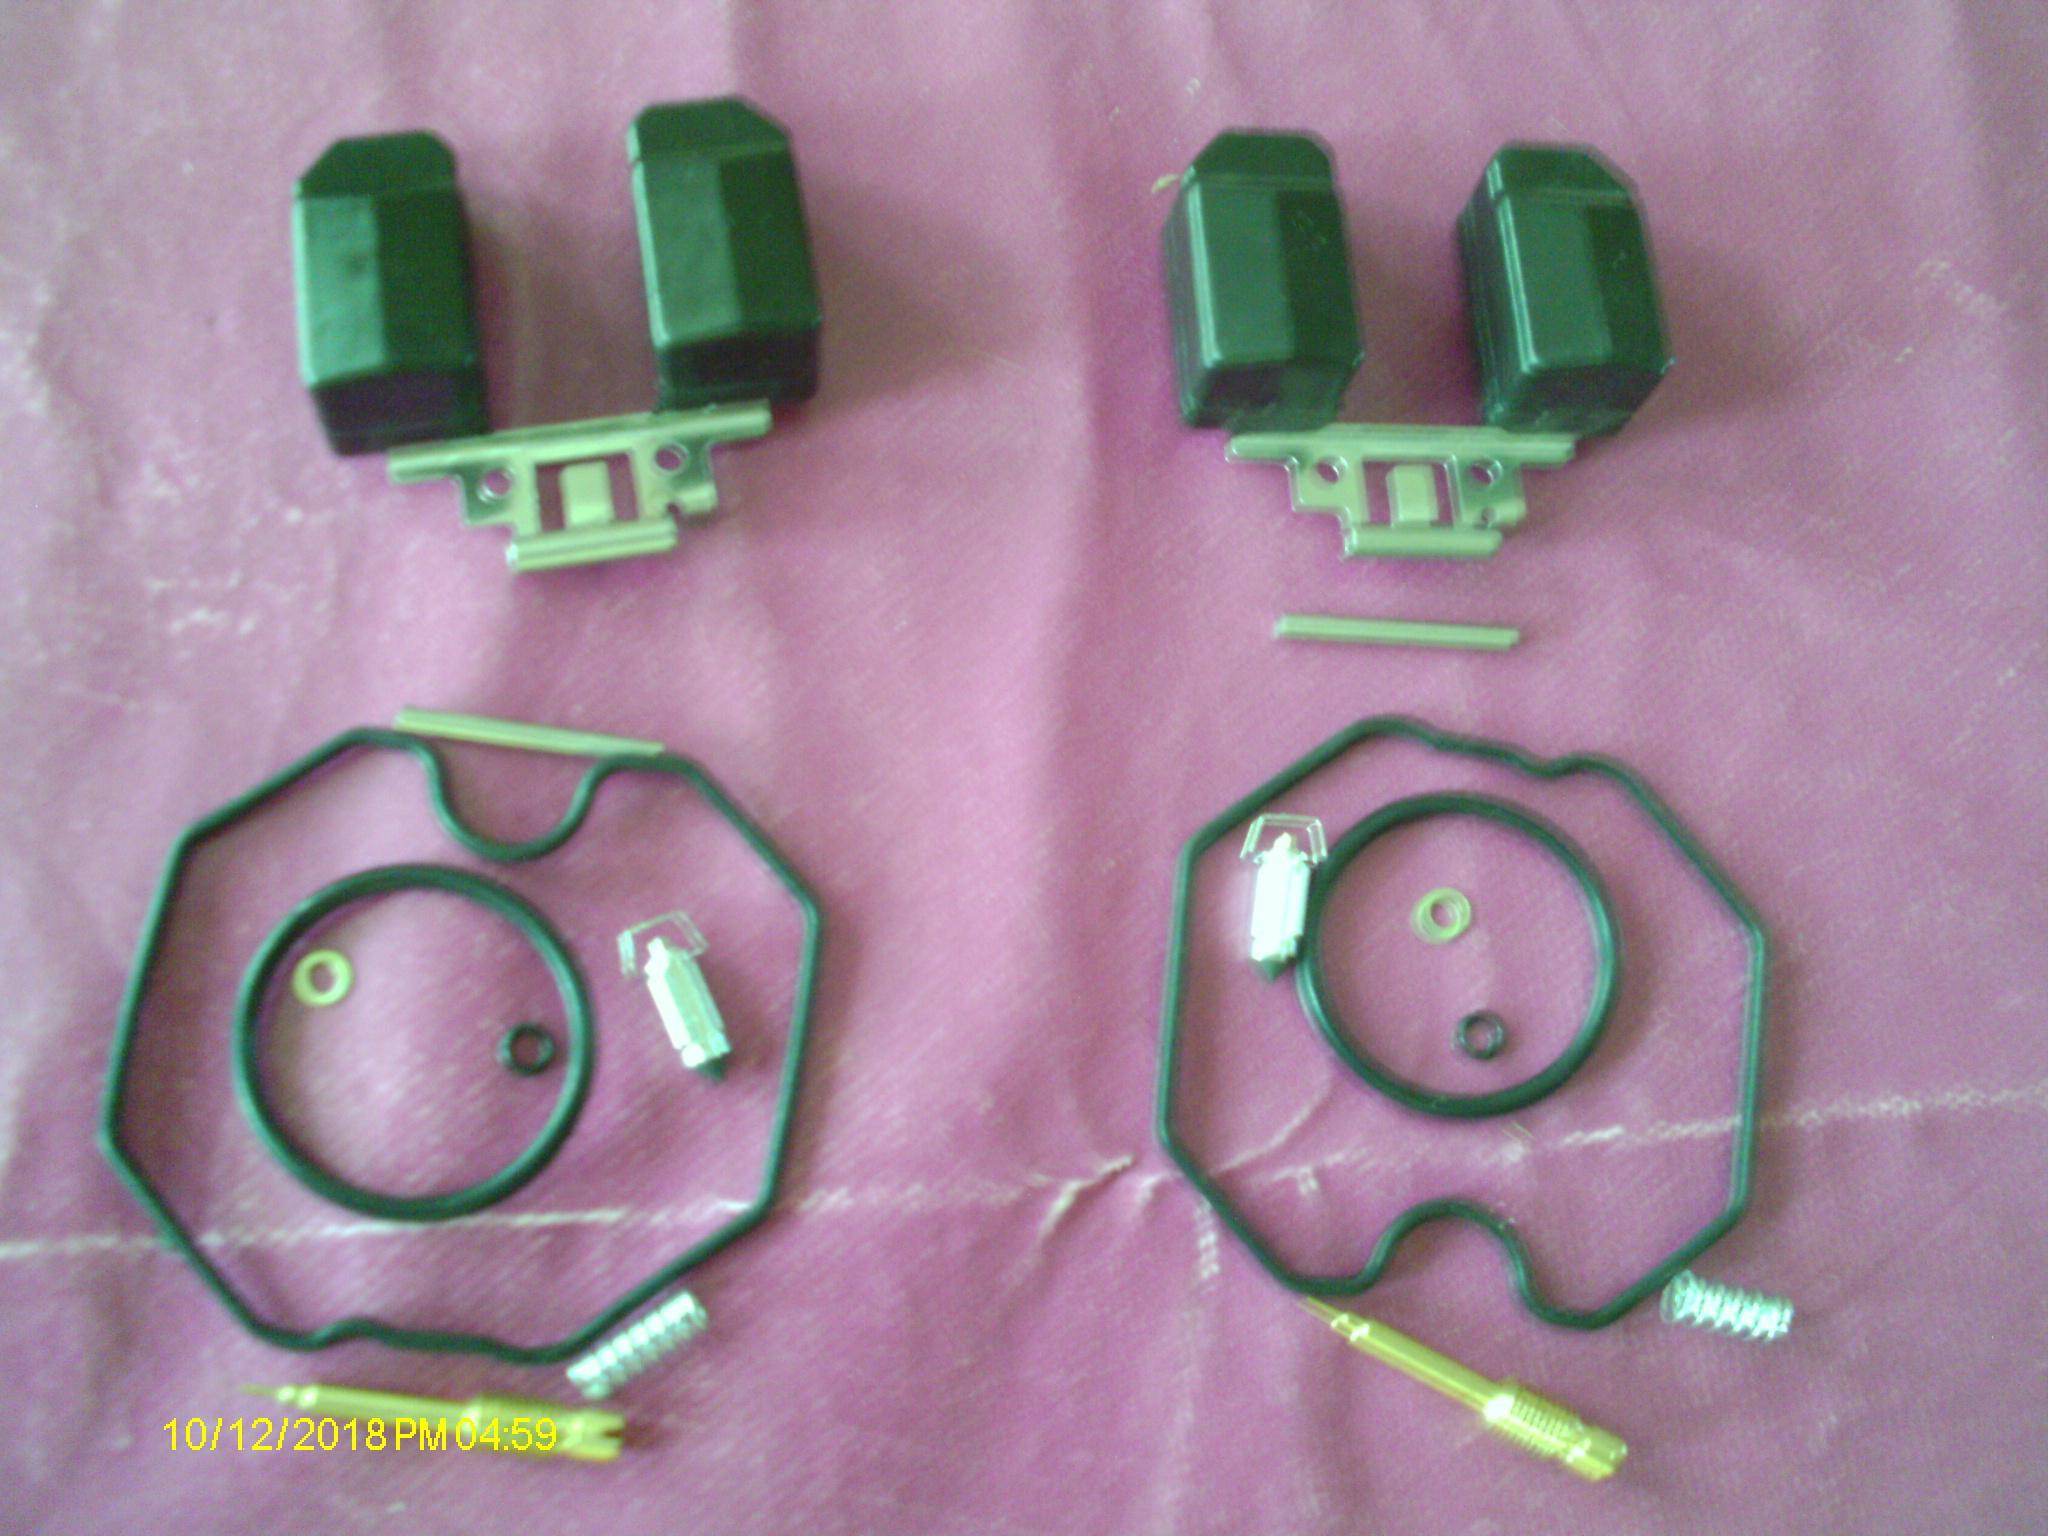 Kit Reparation Carburateur Semi Complet Honda 125 Twin T1 T2 Zen Cart L Art Du E Commerce